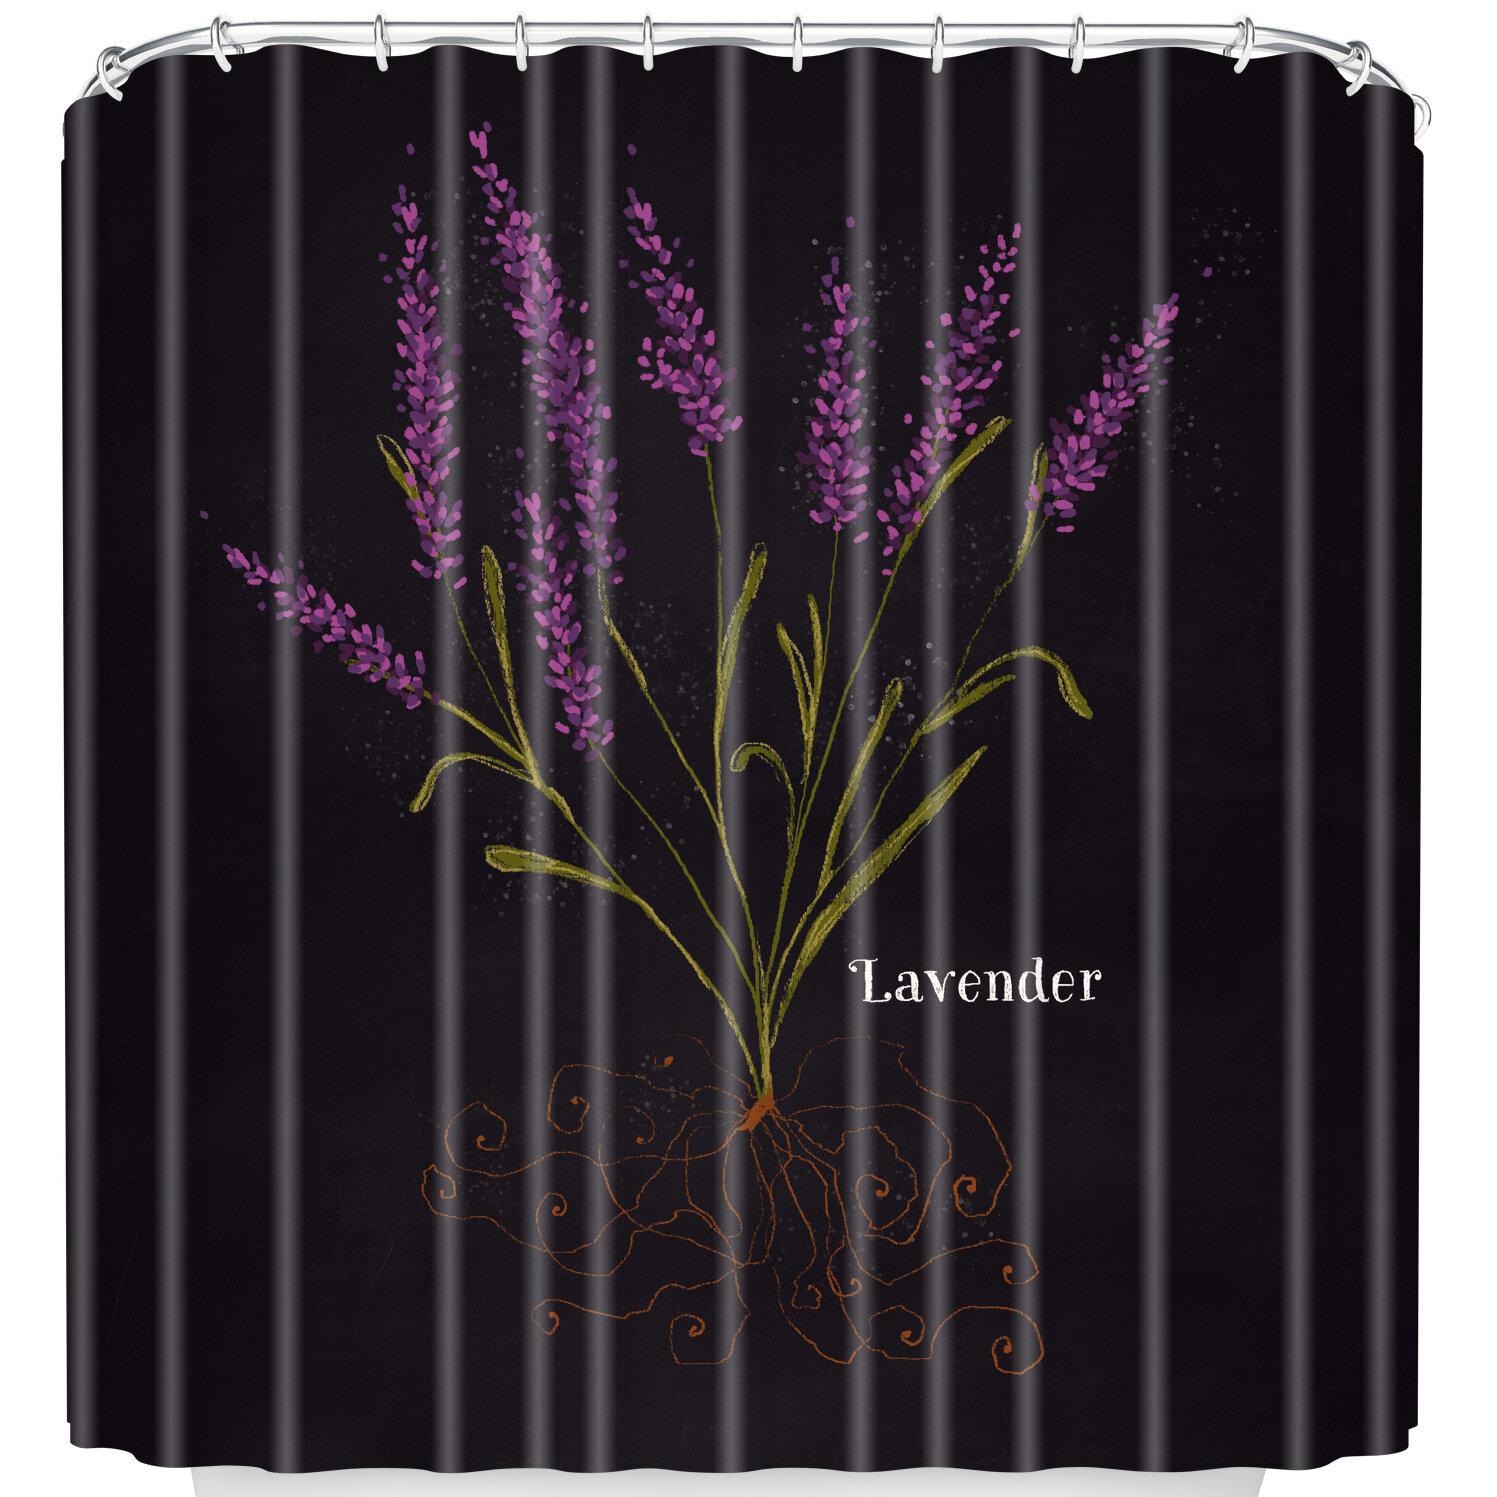 East Urban Home Lavender Shower Curtain | Wayfair